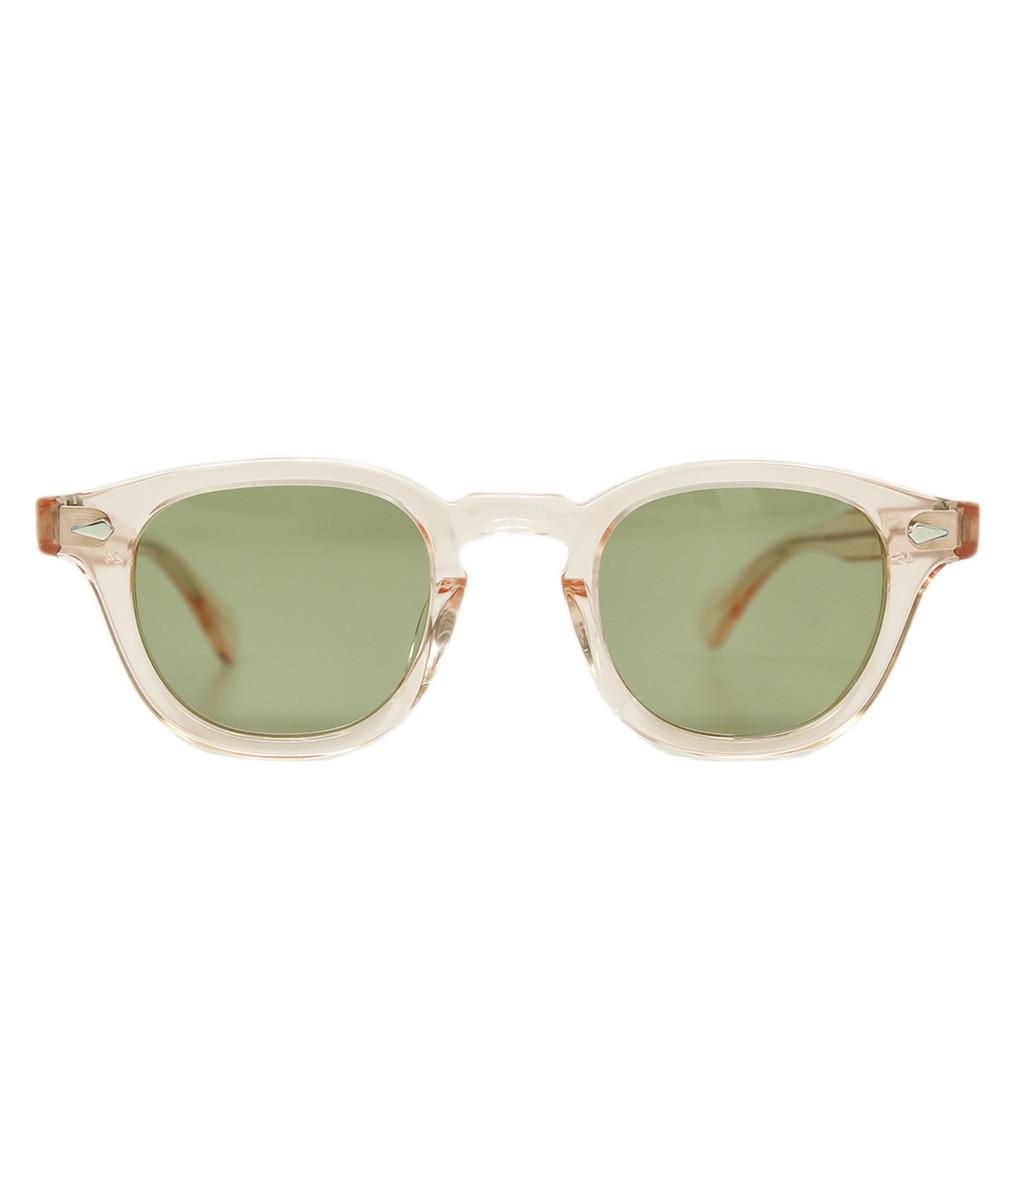 JULIUS TART OPTICAL / ジュリアスタートオプティカル : AR 42-22 46-24 -FRESH PINK / GREEN- : サングラス アクセサリー メガネ 眼鏡 : JTPL-009H-102H-GN-30-wise【WIS】